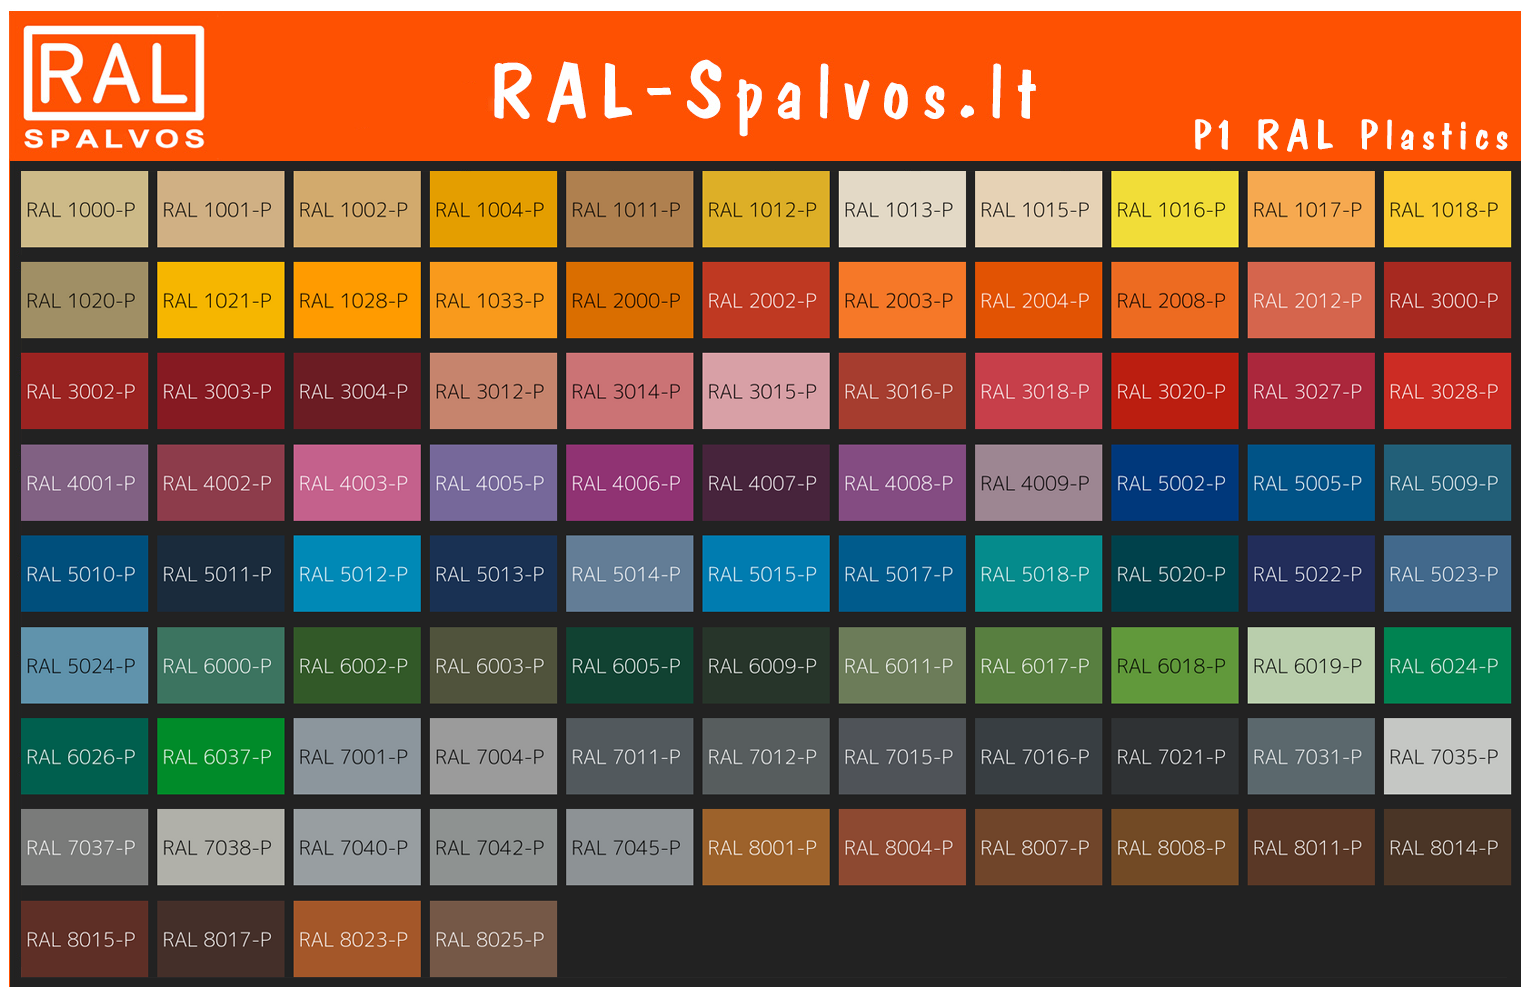 RAL Plastics P1 spalvų katalogas